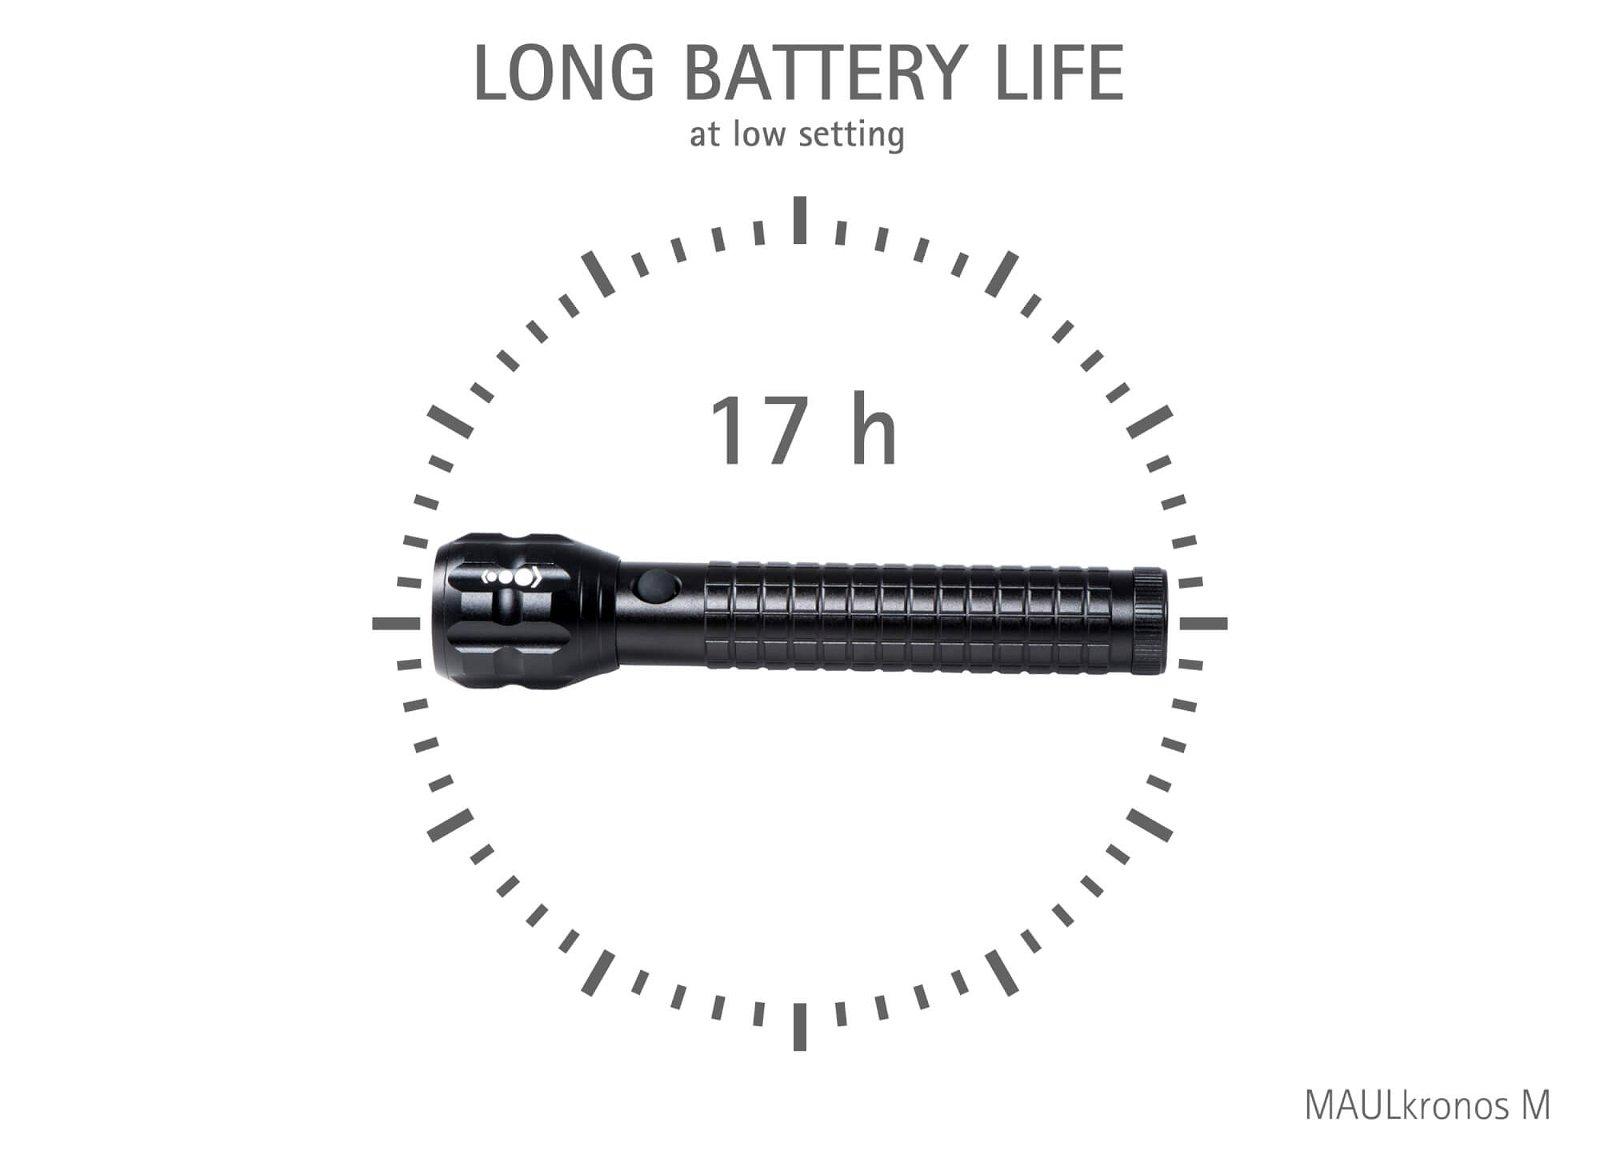 LED-Taschenlampe MAULkronos M - Leuchtdauer